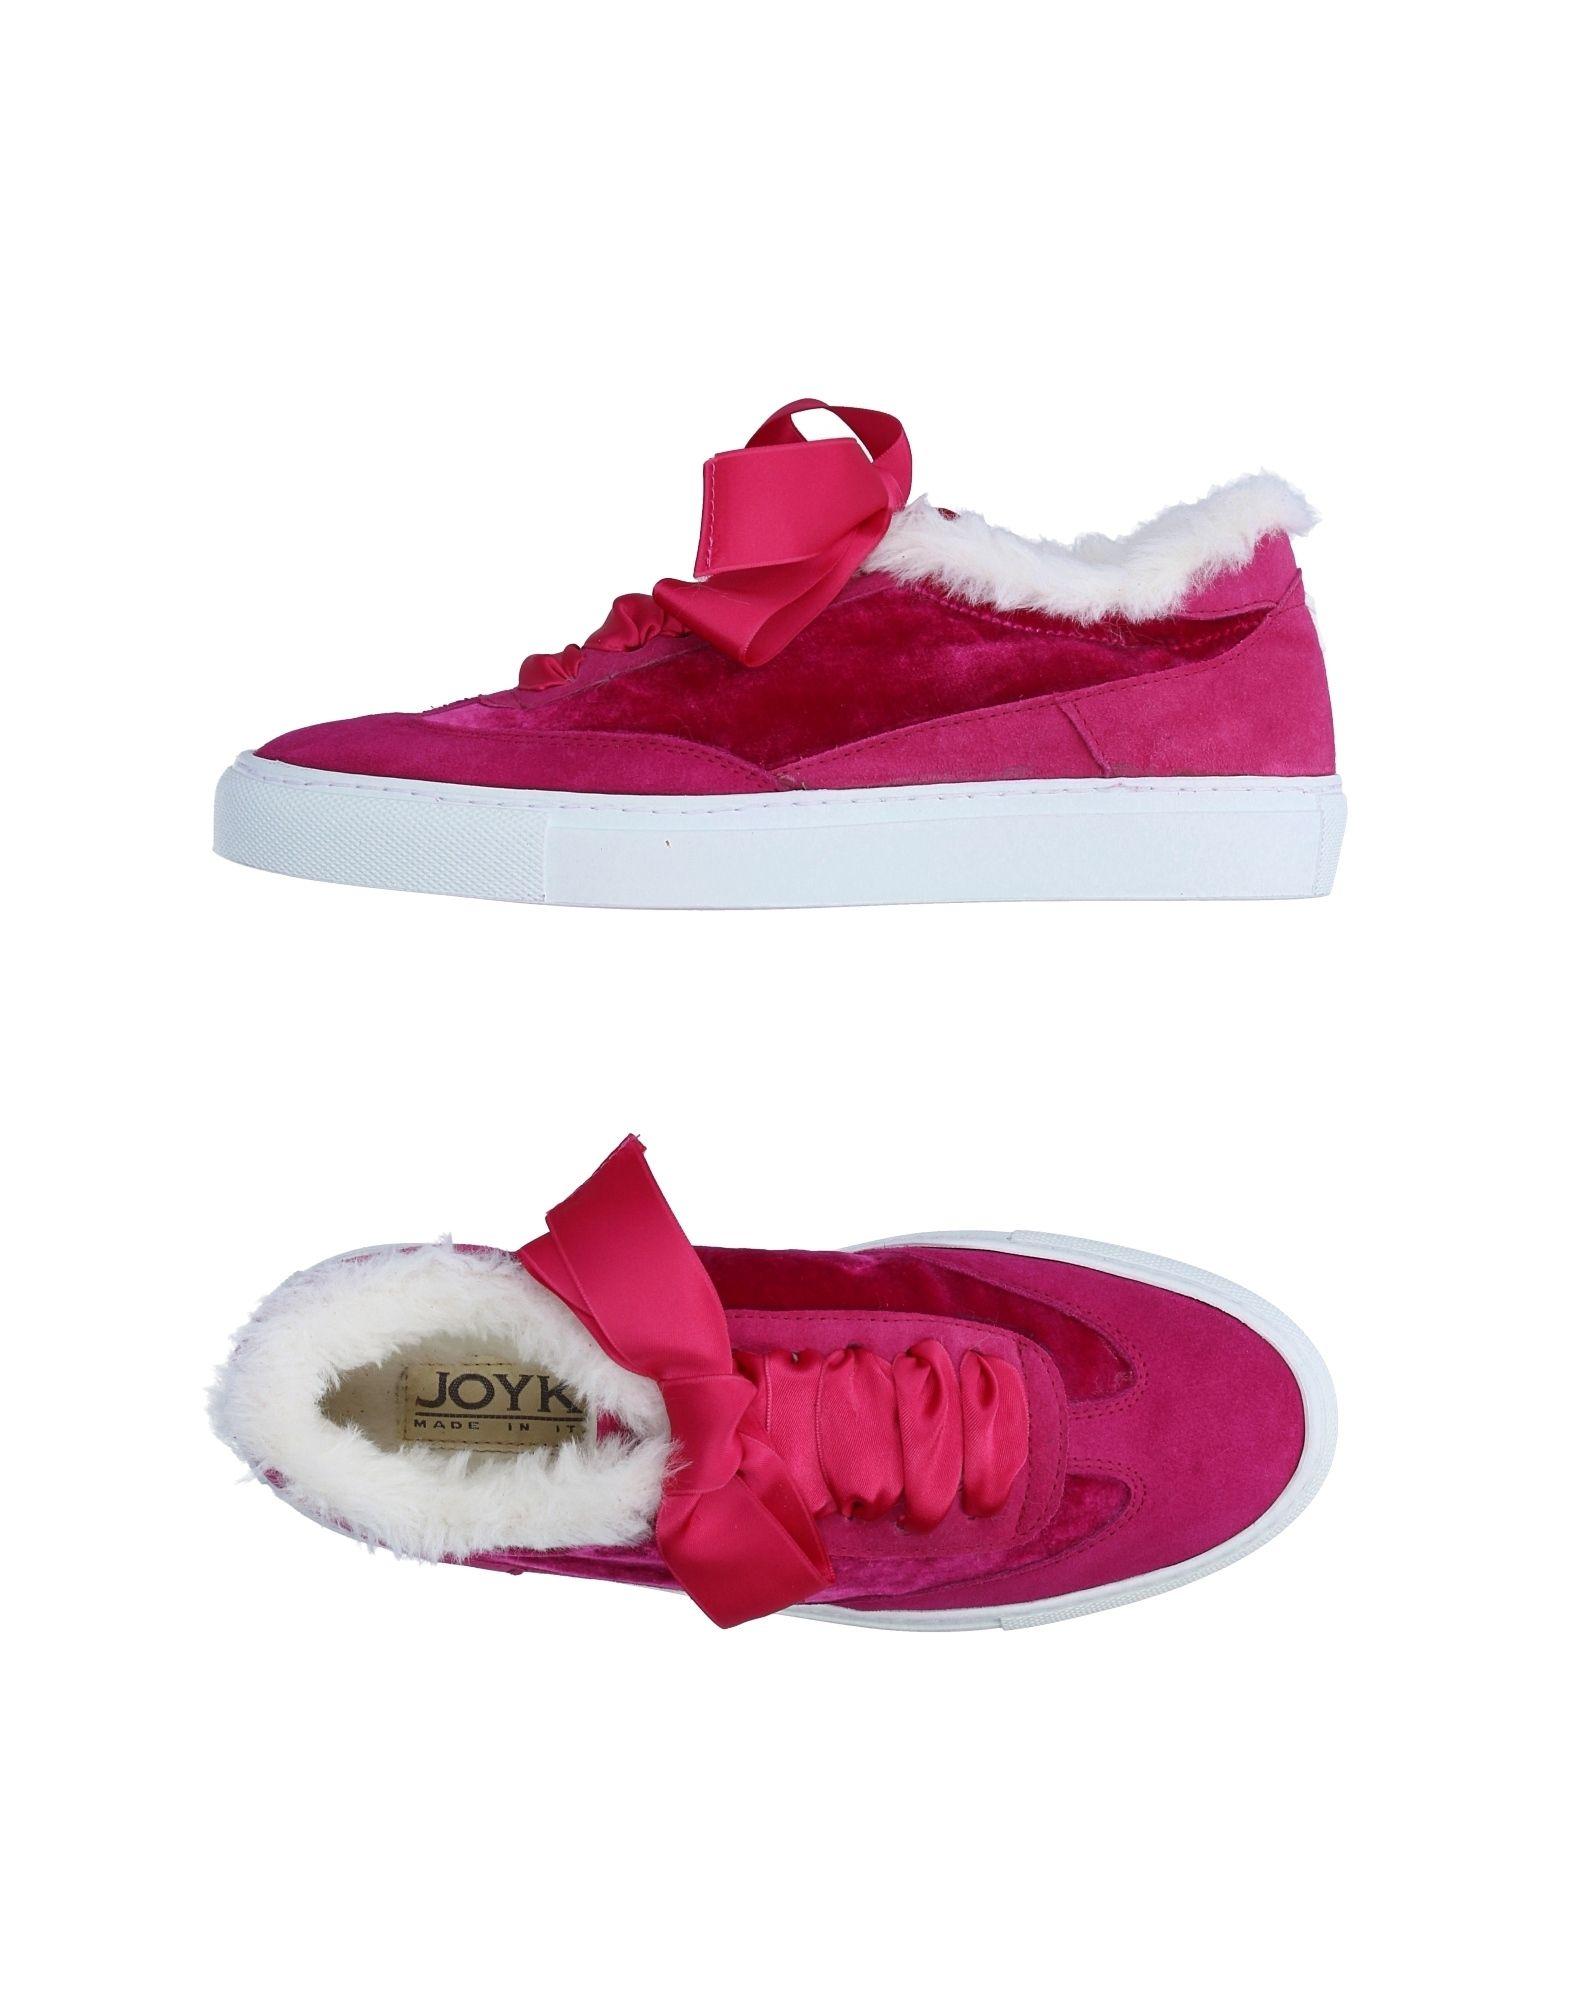 Joyks Sneakers Damen  11310722EI Gute Qualität beliebte Schuhe